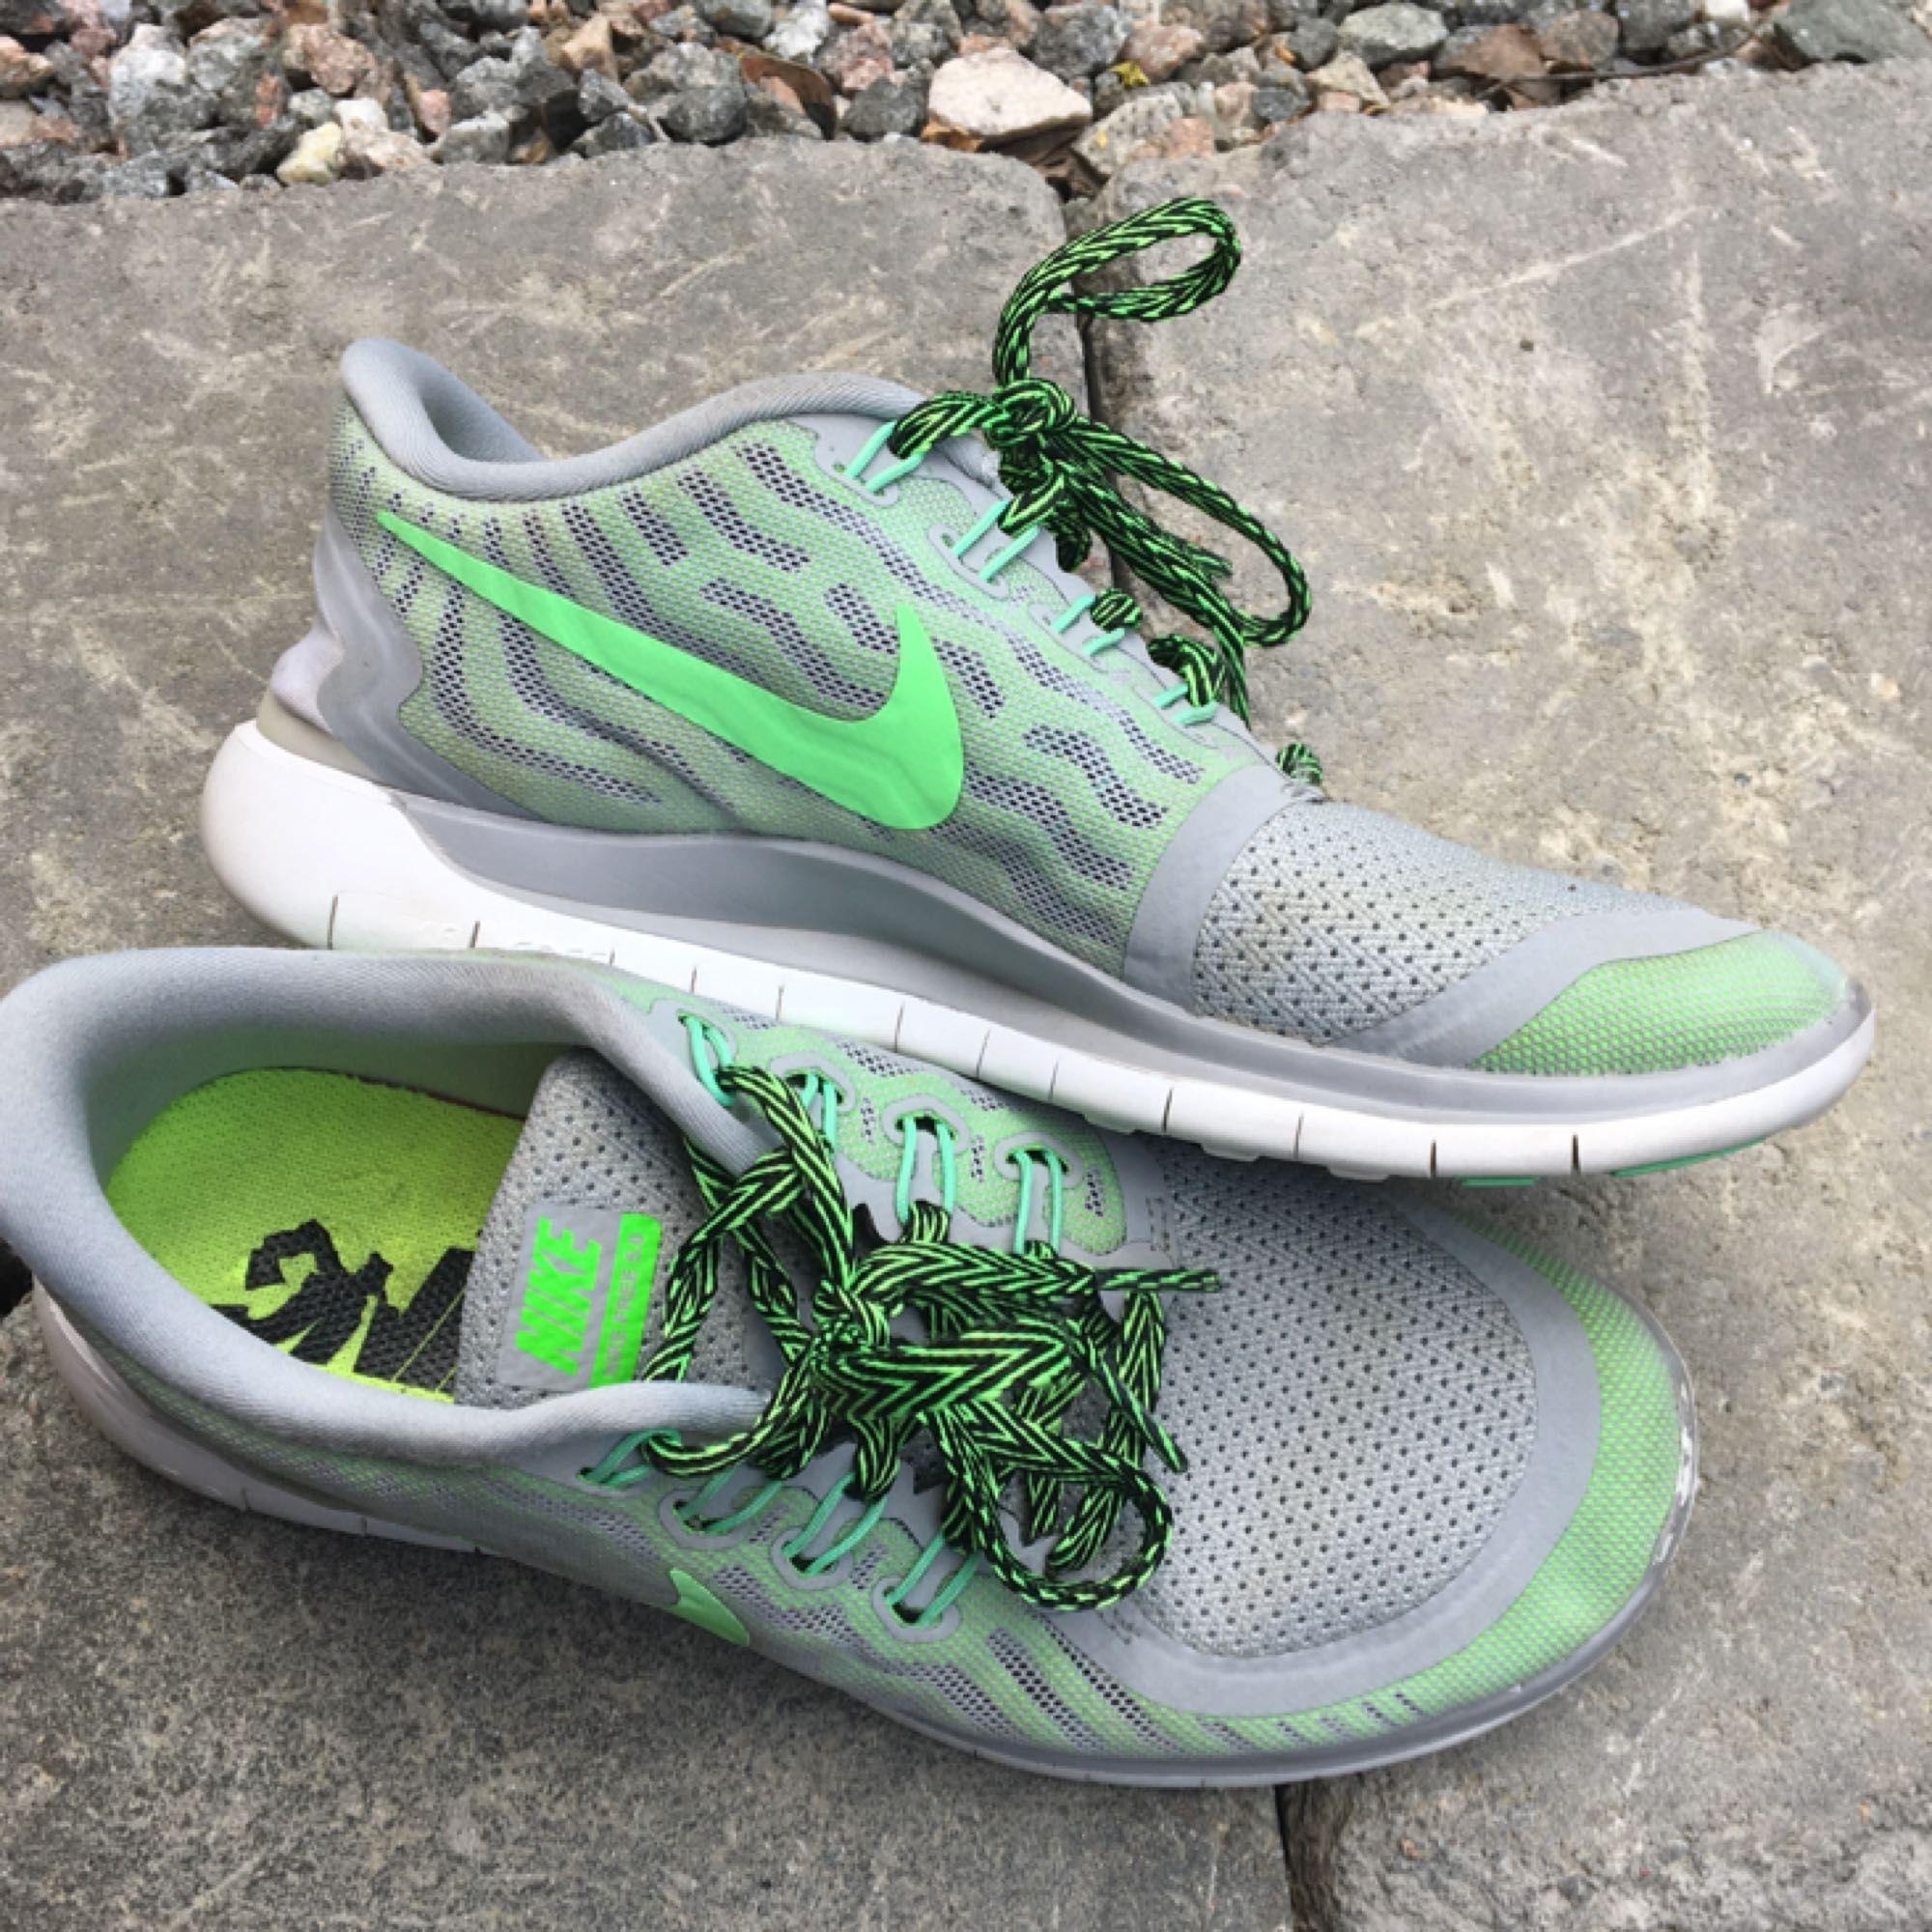 official photos 71ead 52390 Nike free run 5.0 Storlek 38, 24 cm innermått.